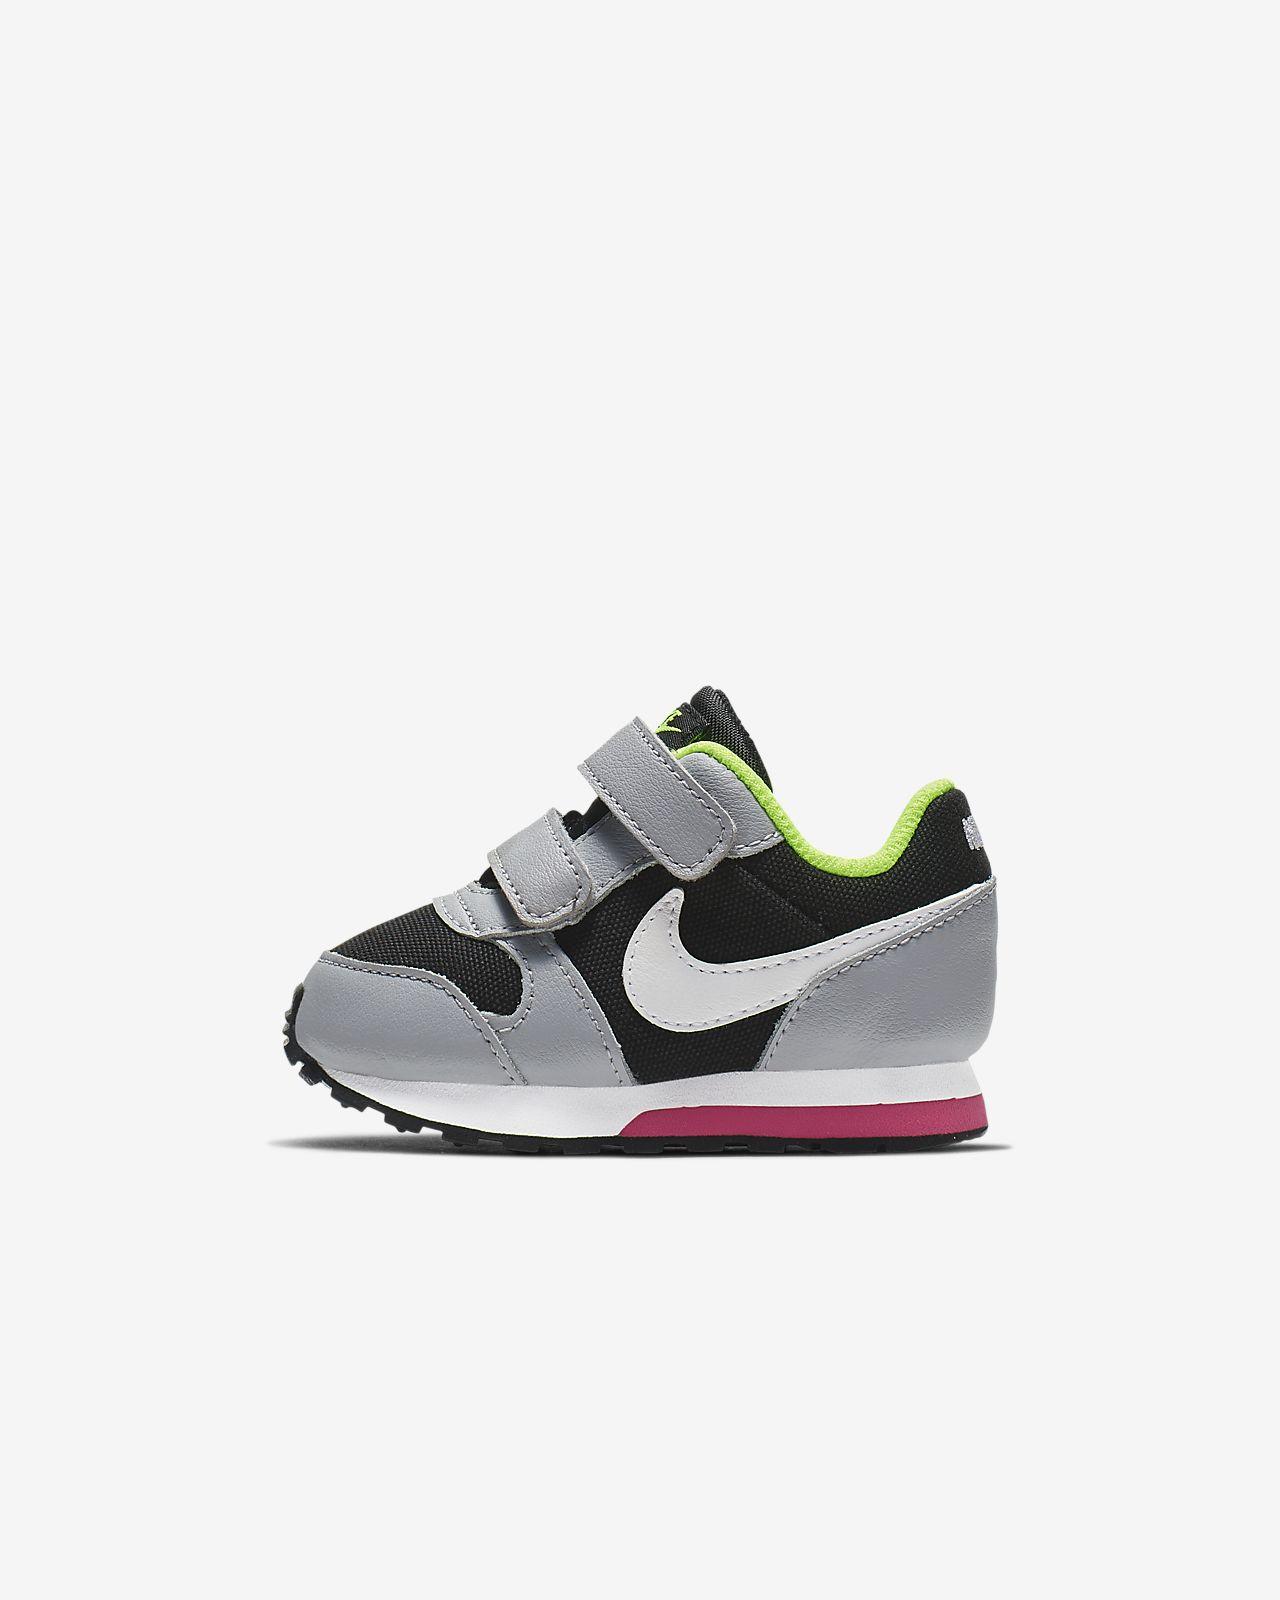 d010f65c6 Nike MD Runner 2 Zapatillas - Bebé e infantil. Nike.com ES